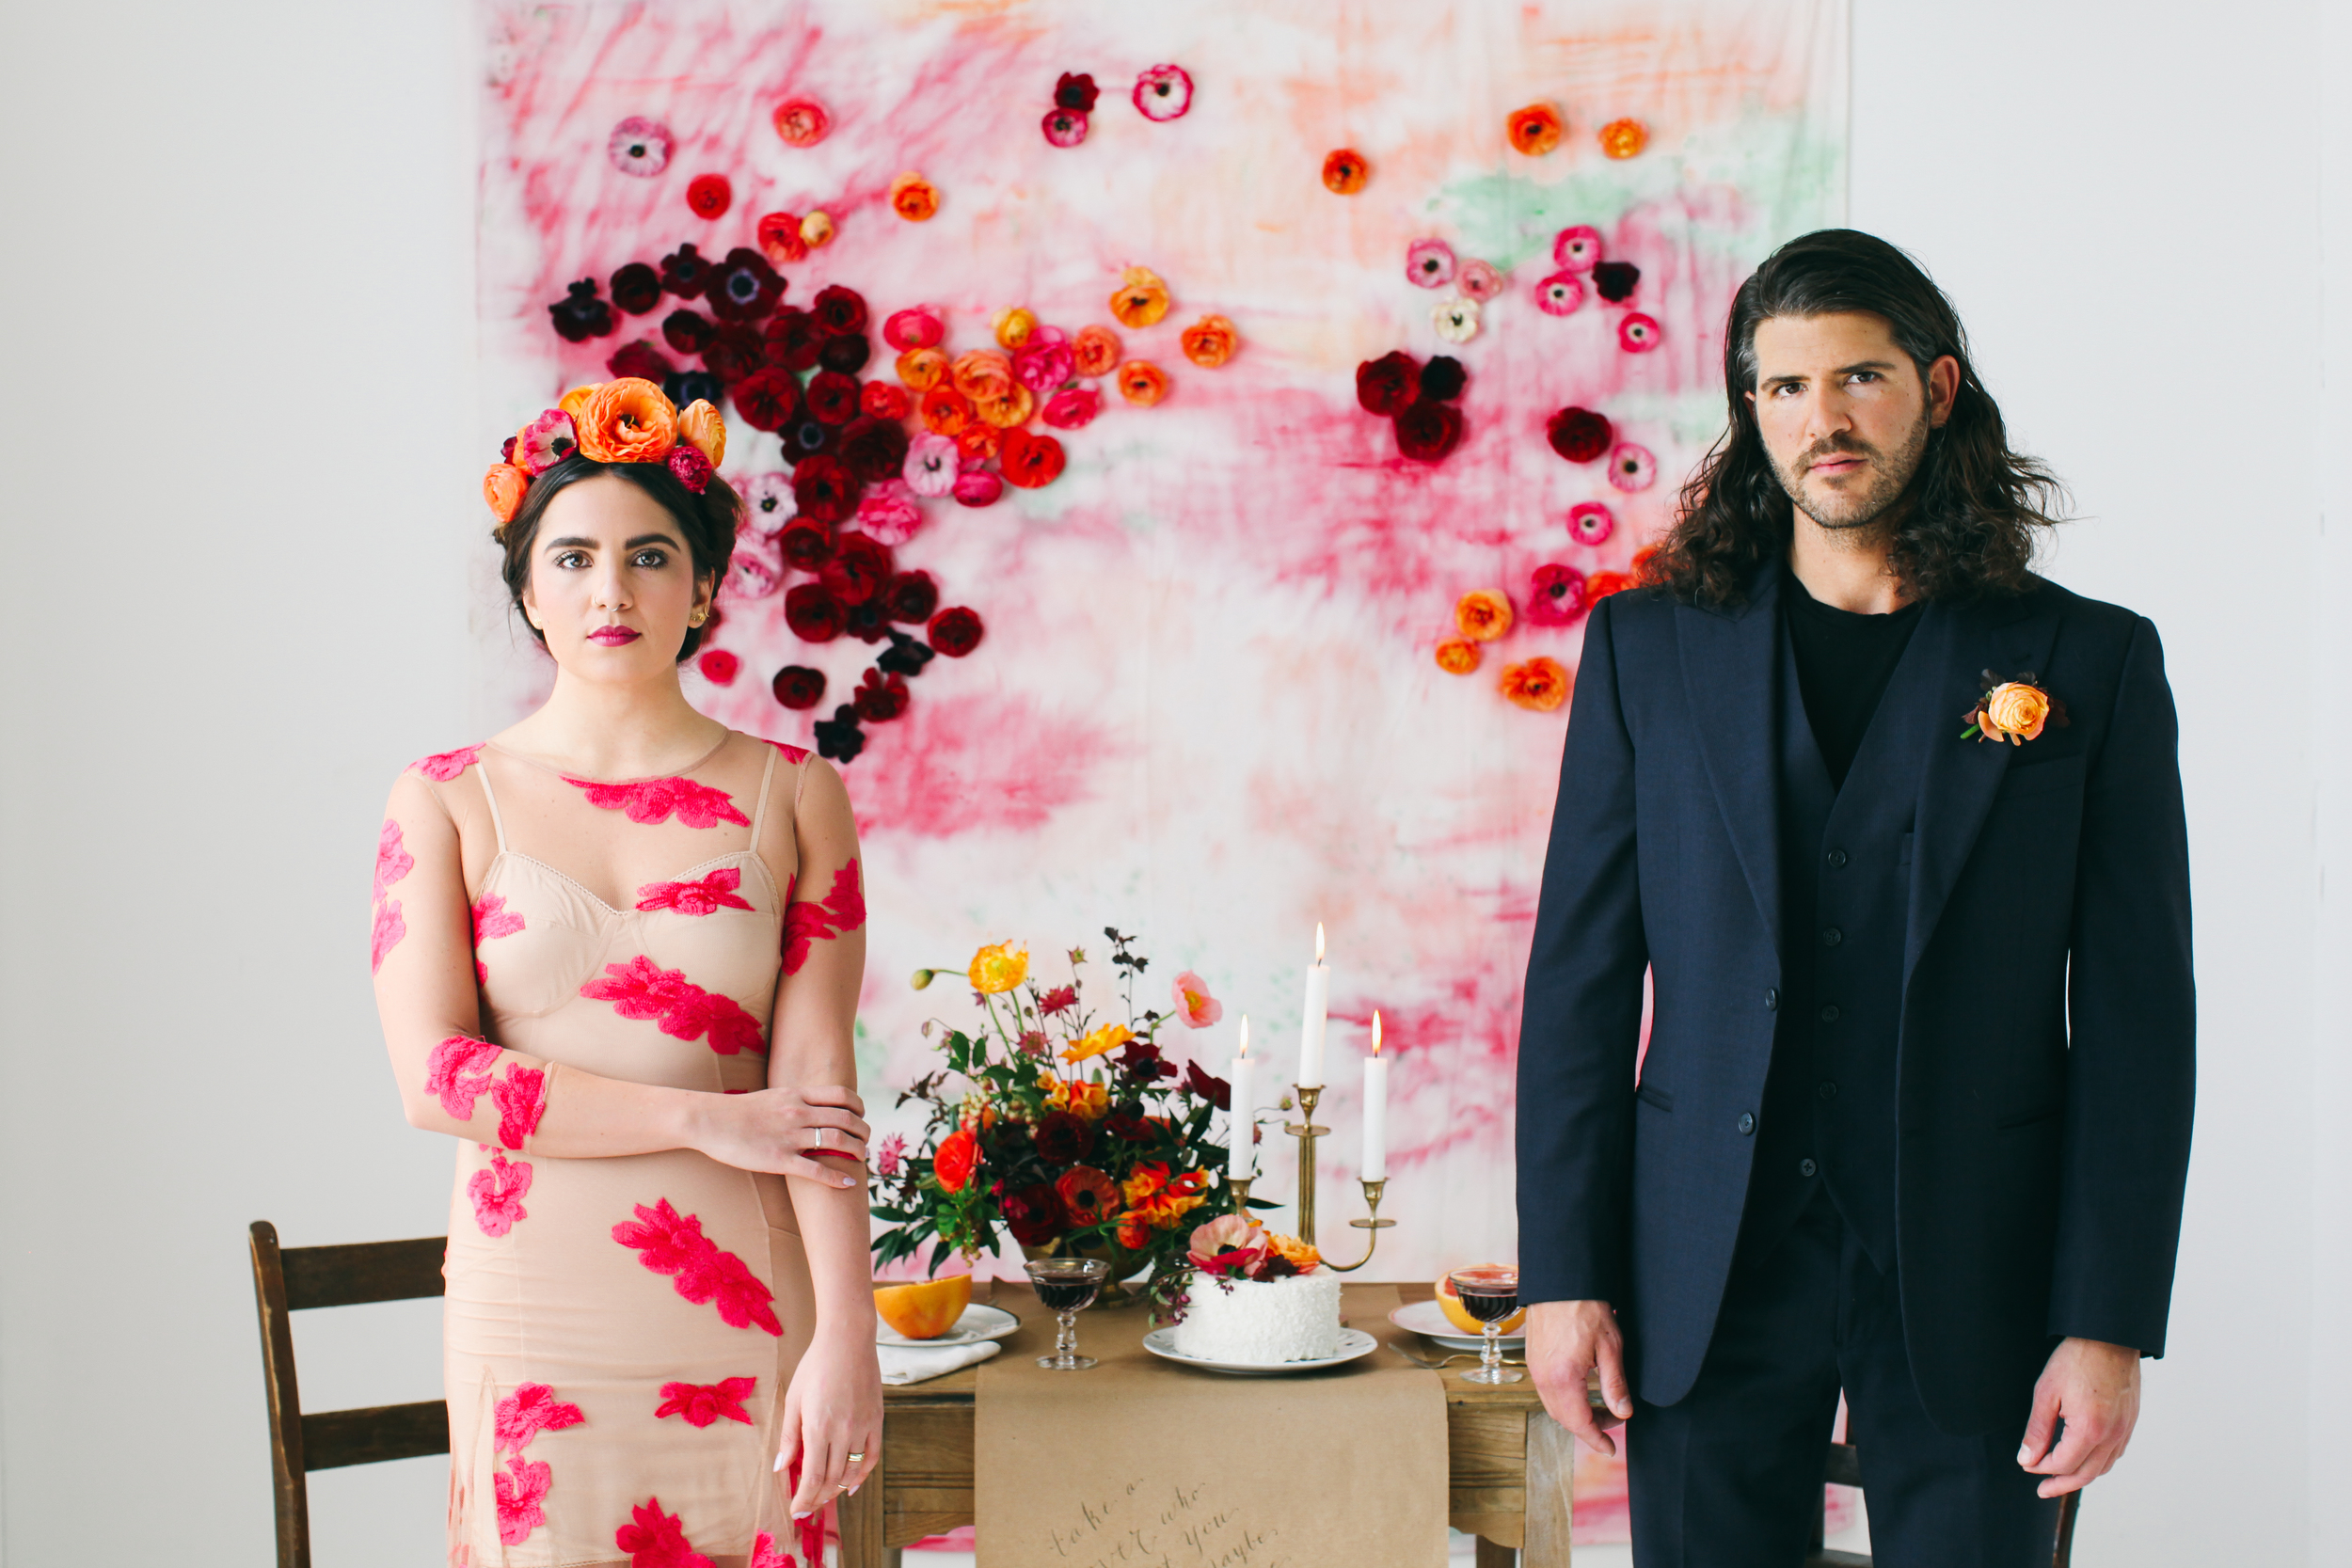 Love Lit Wedding Photography - Frida-11.jpg